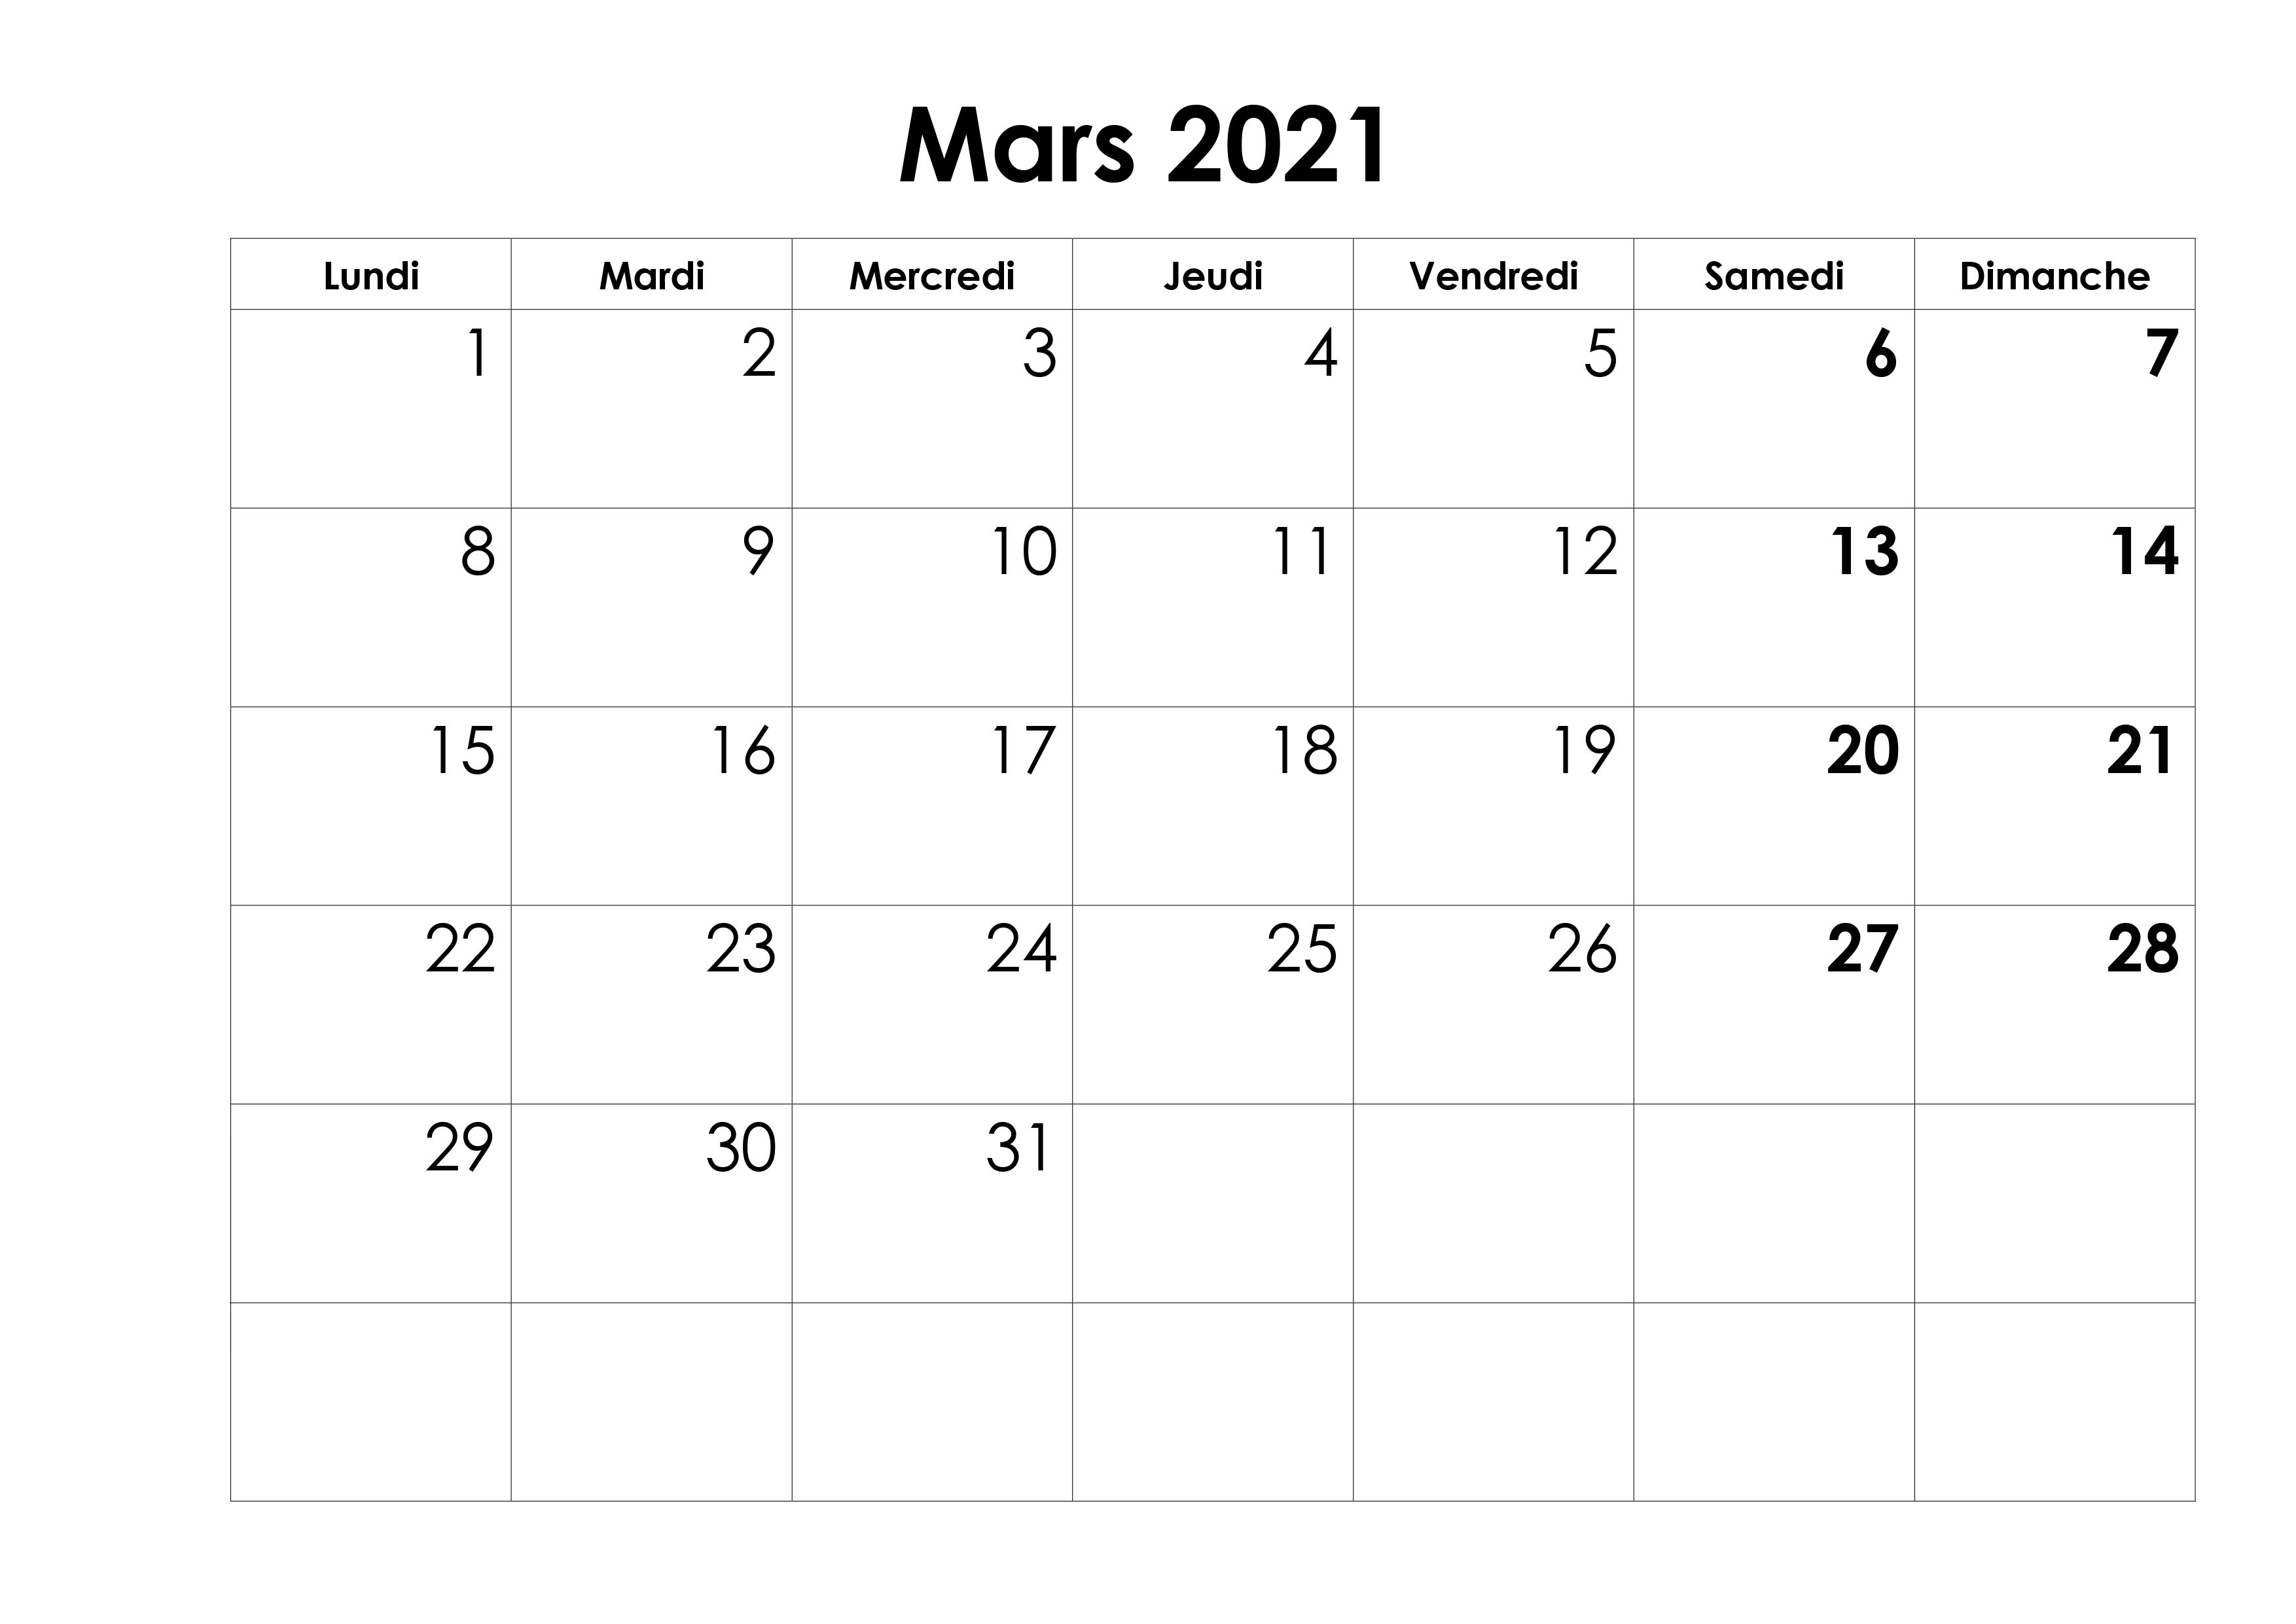 Calendrier Mars 2021 Pdf Calendrier Mars 2021 Modèles Imprimables [PDF,Word,Excel] | The